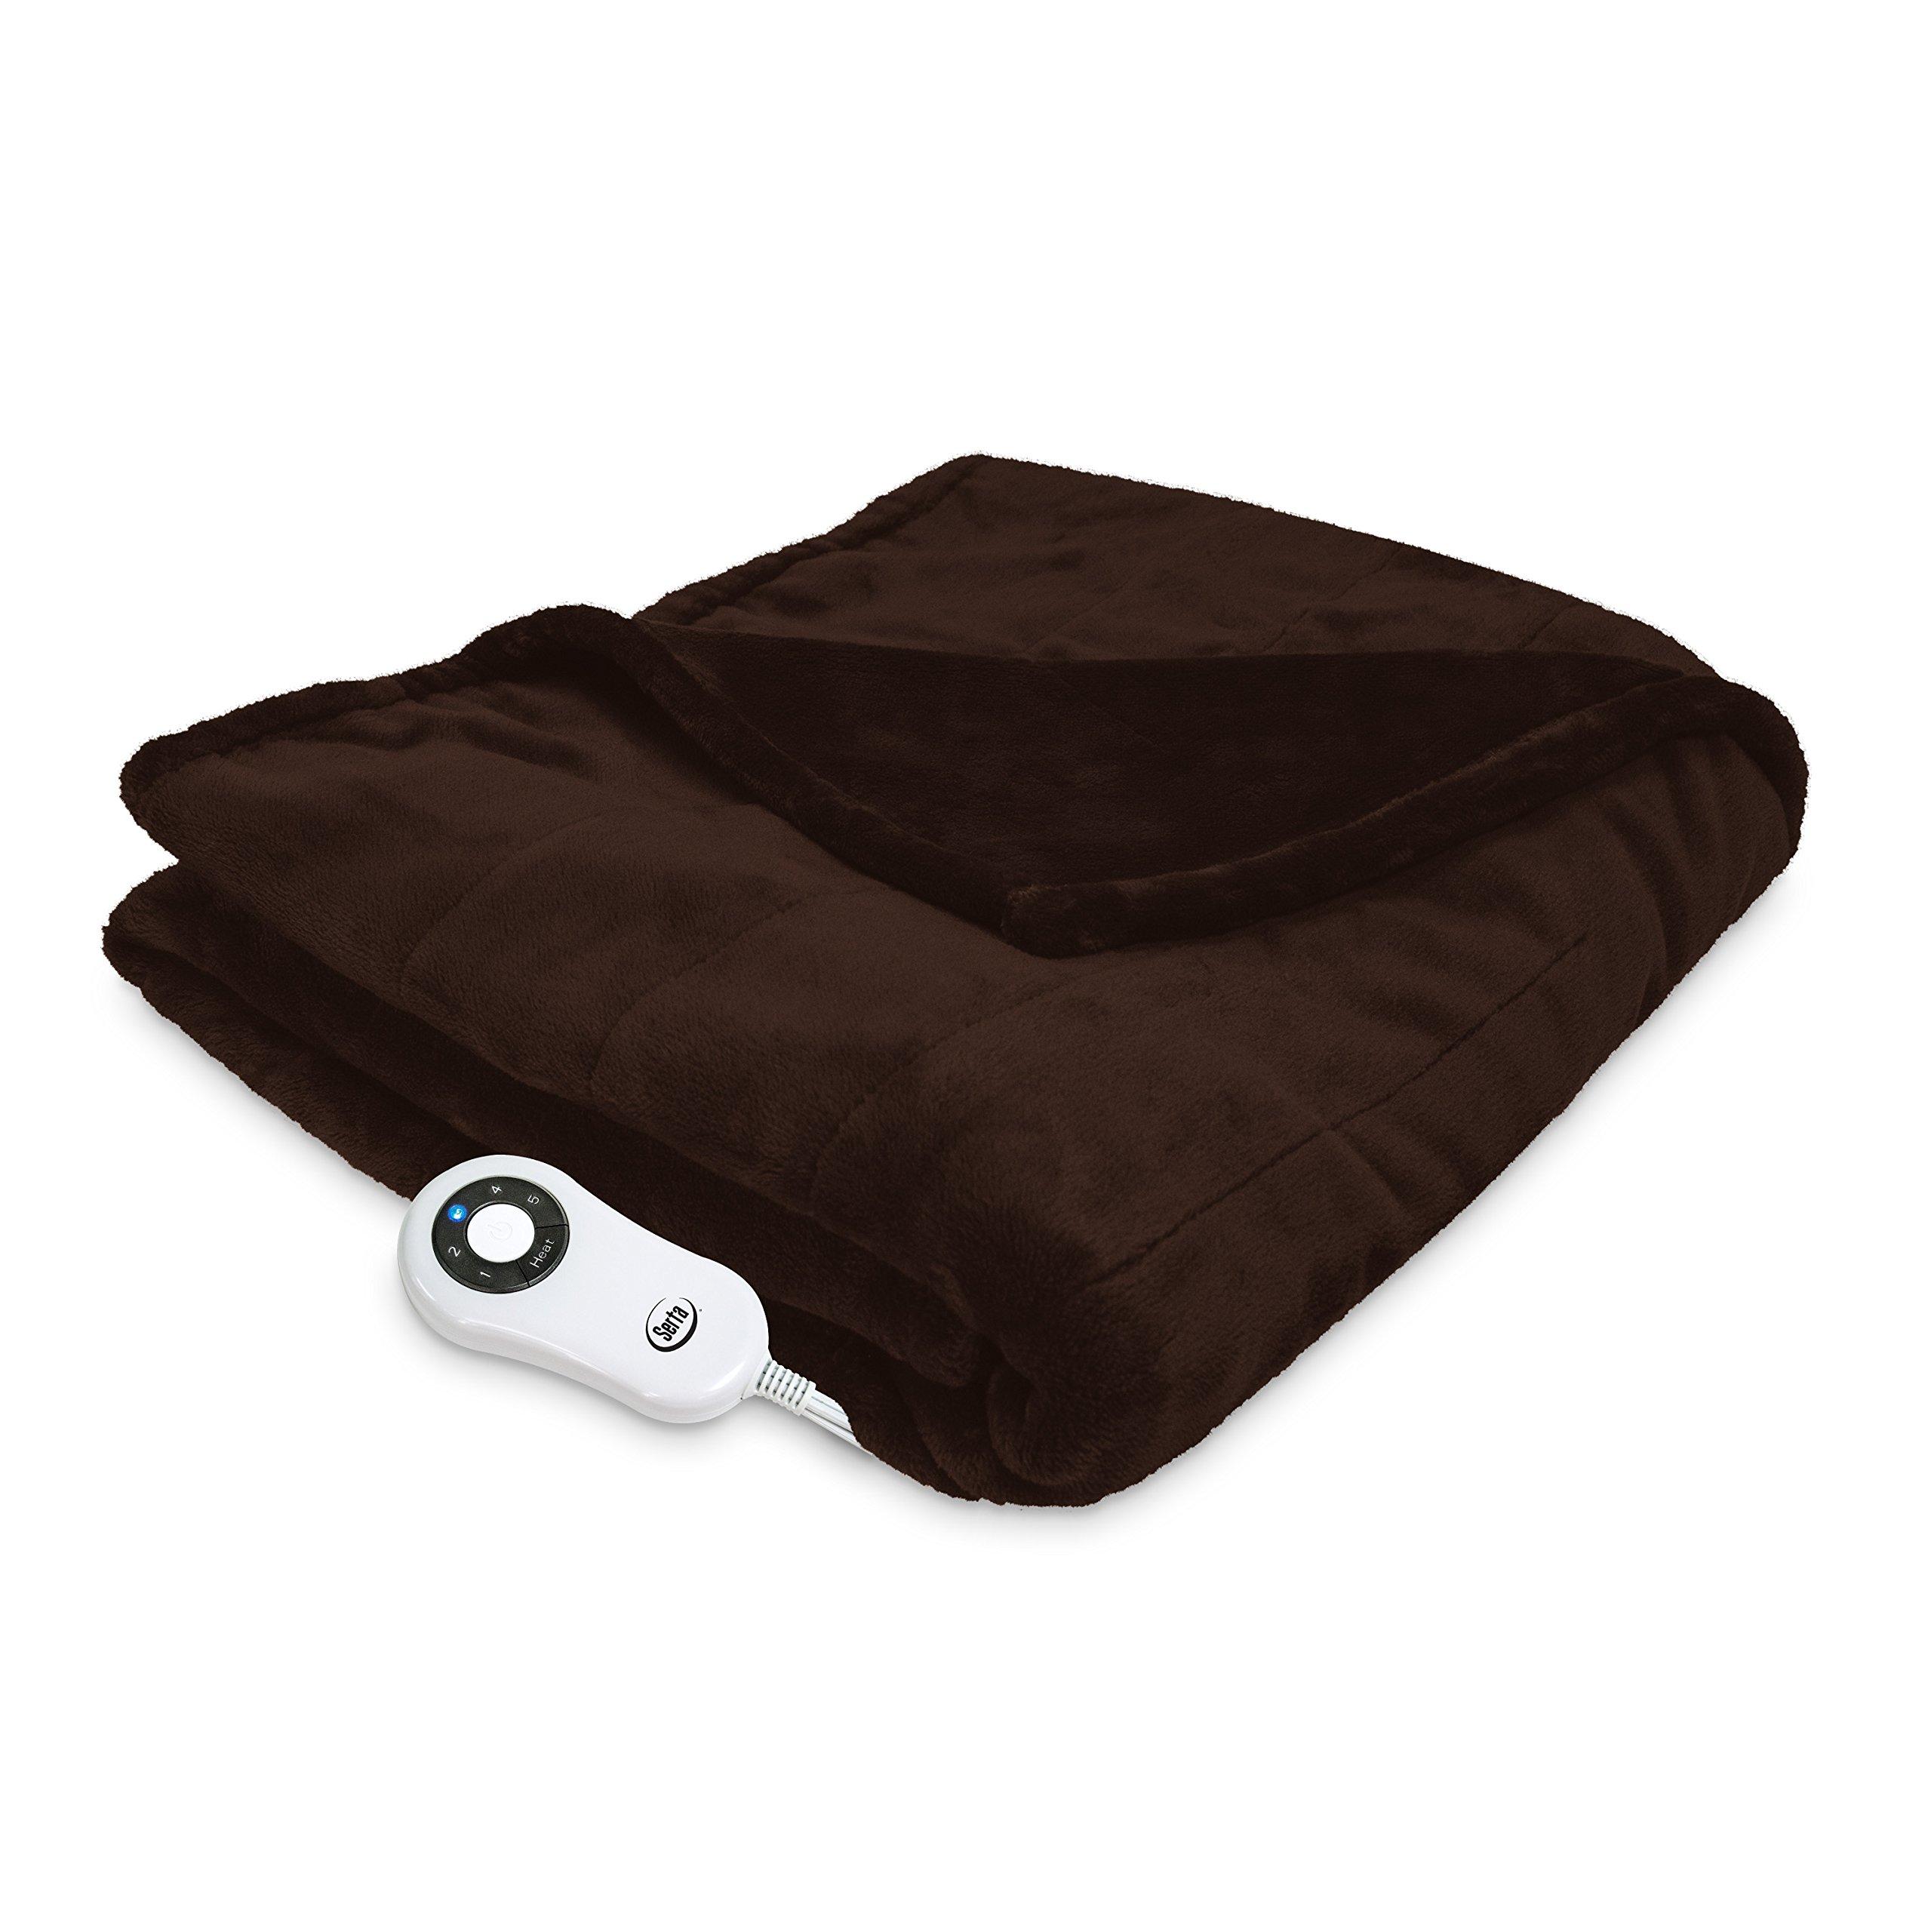 Serta 861058 Silky Plush Heated-with 5 Setting Controller, 40'' x 70'', Chocolate